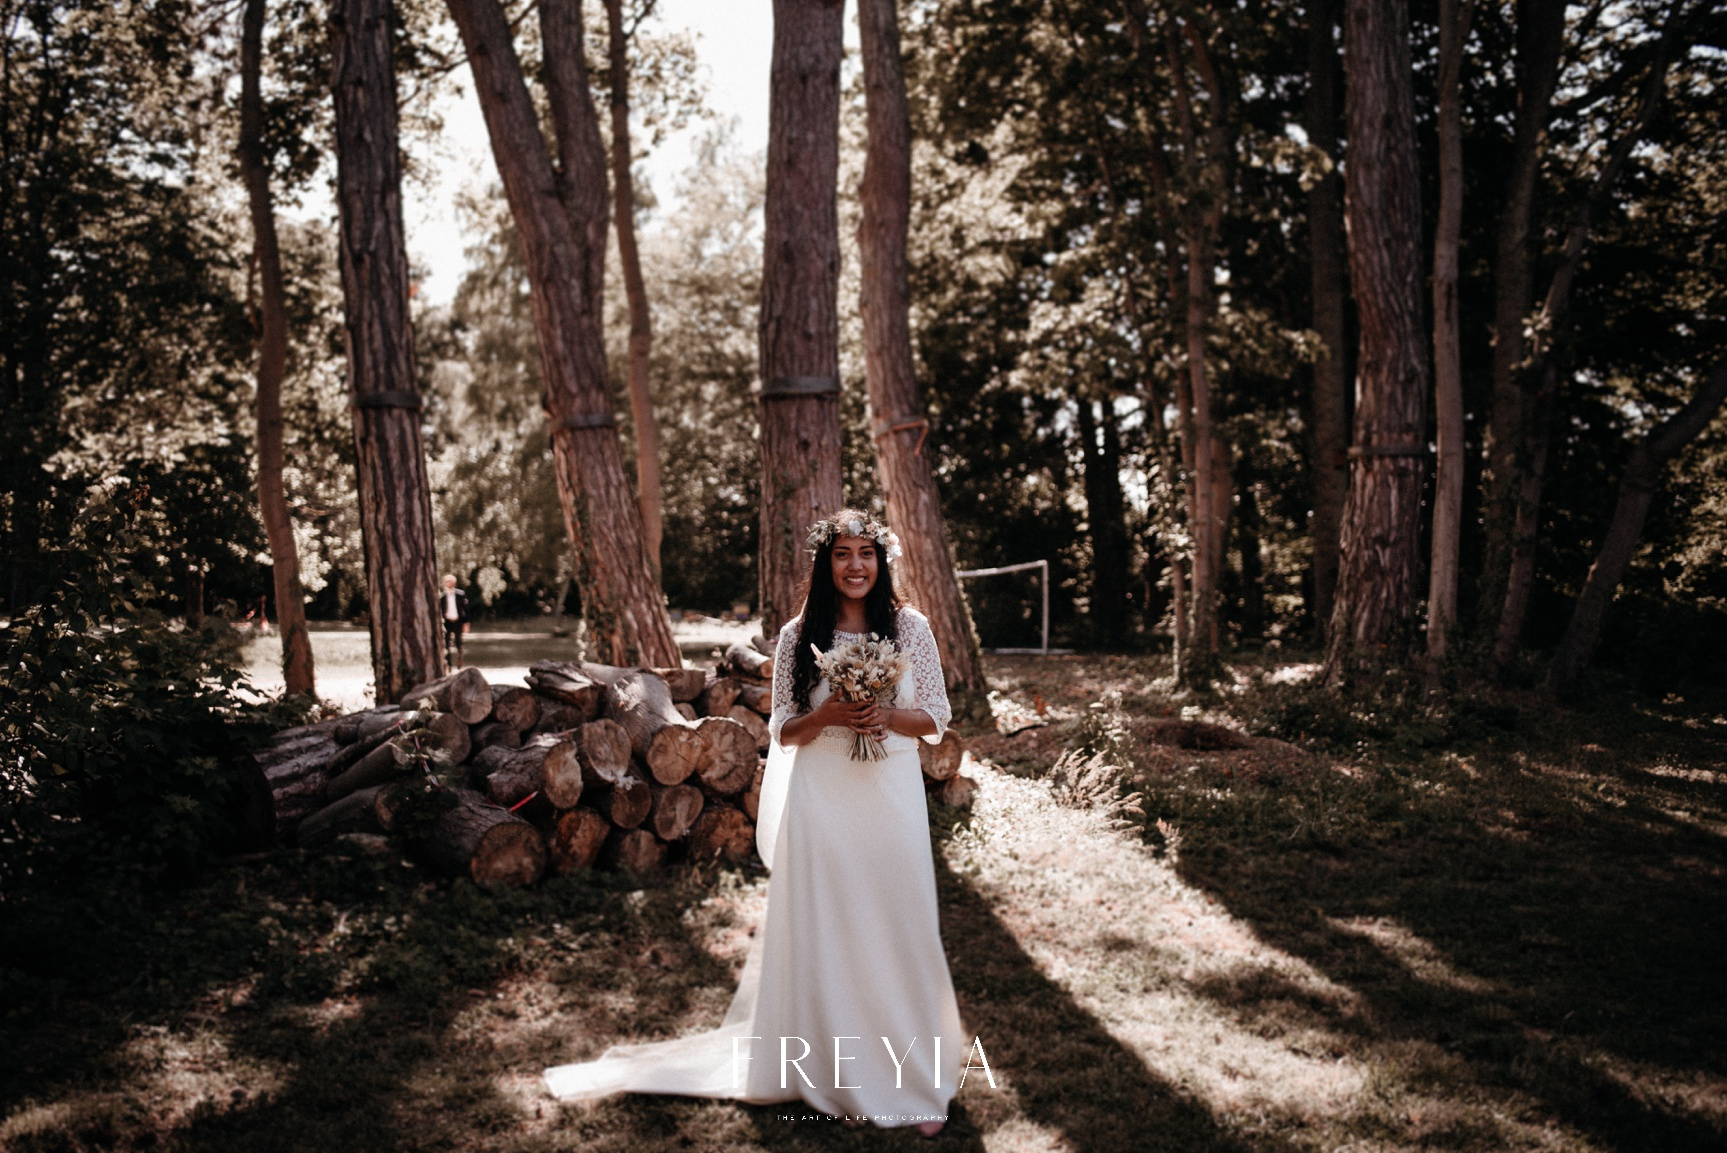 R + T |  mariage reportage alternatif moody intime minimaliste vintage naturel boho boheme |  PHOTOGRAPHE mariage PARIS france destination  | FREYIA photography_-214.jpg